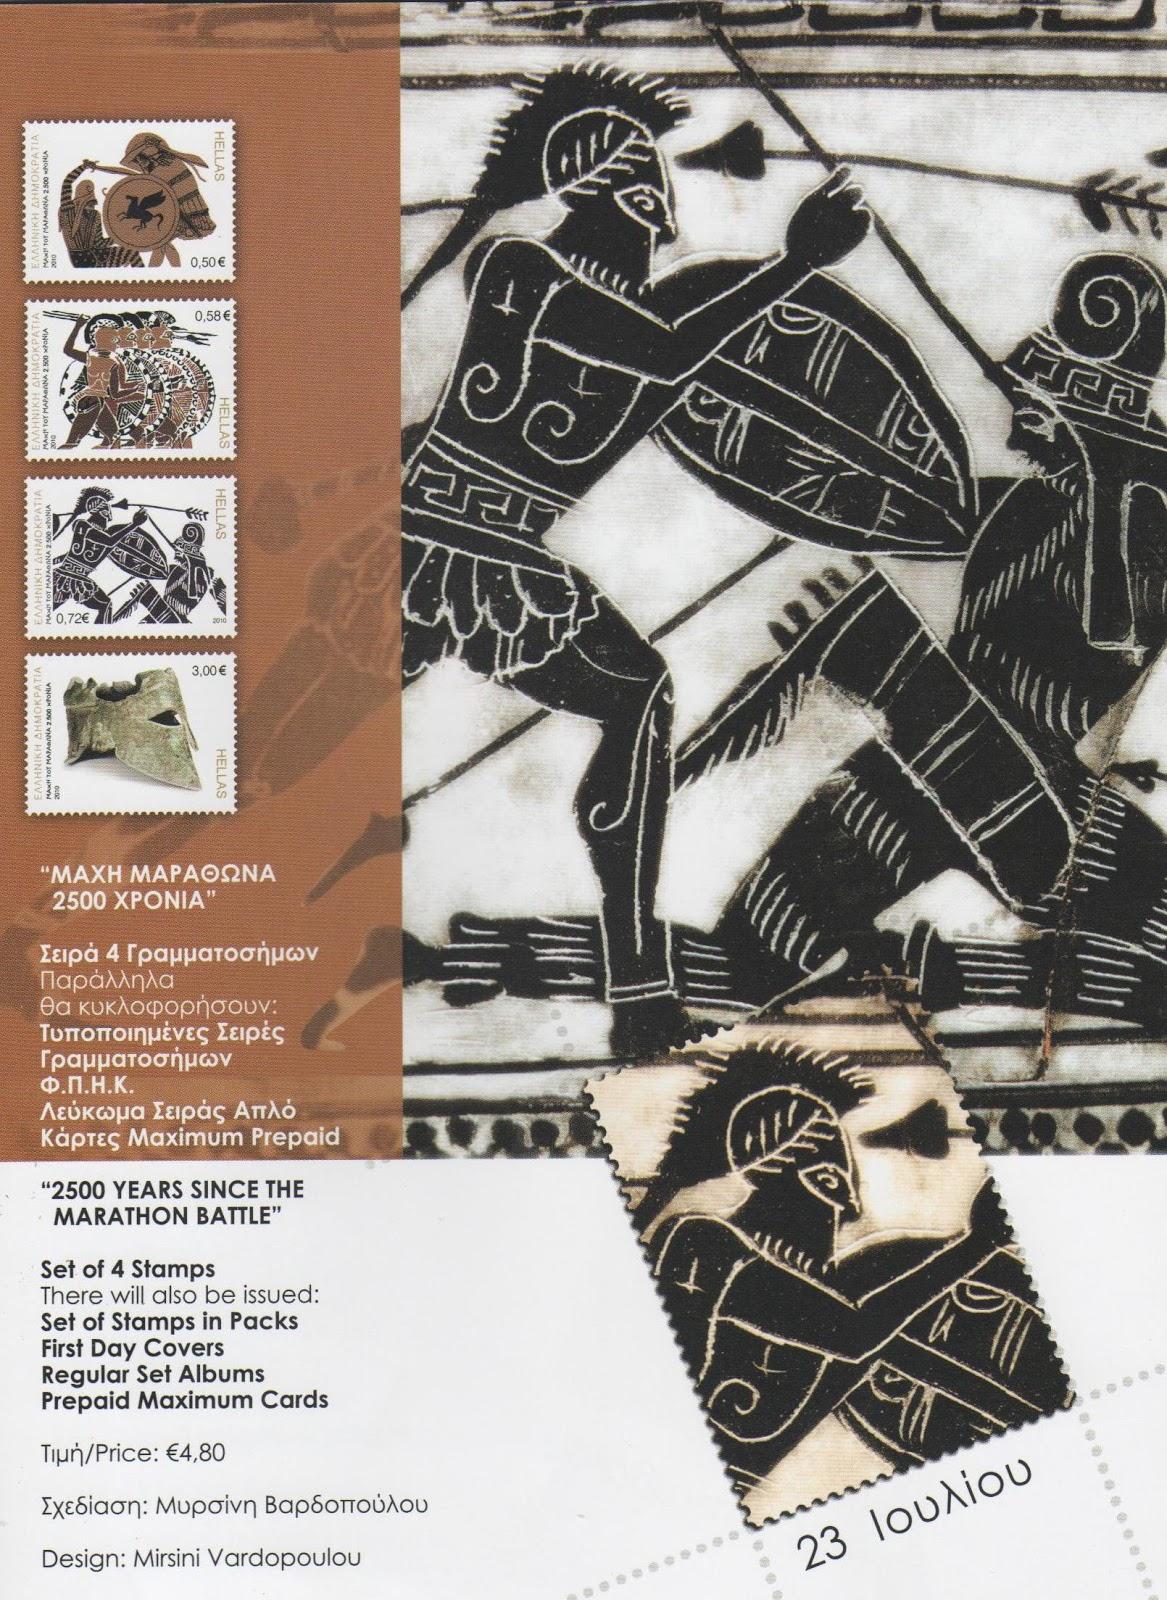 arx+001 Mε έκδοση σειράς γραμματοσήμων τα ΕΛΤΑ τιμούν τα 2.500 χρόνια της Μάχης του Μαραθώνα